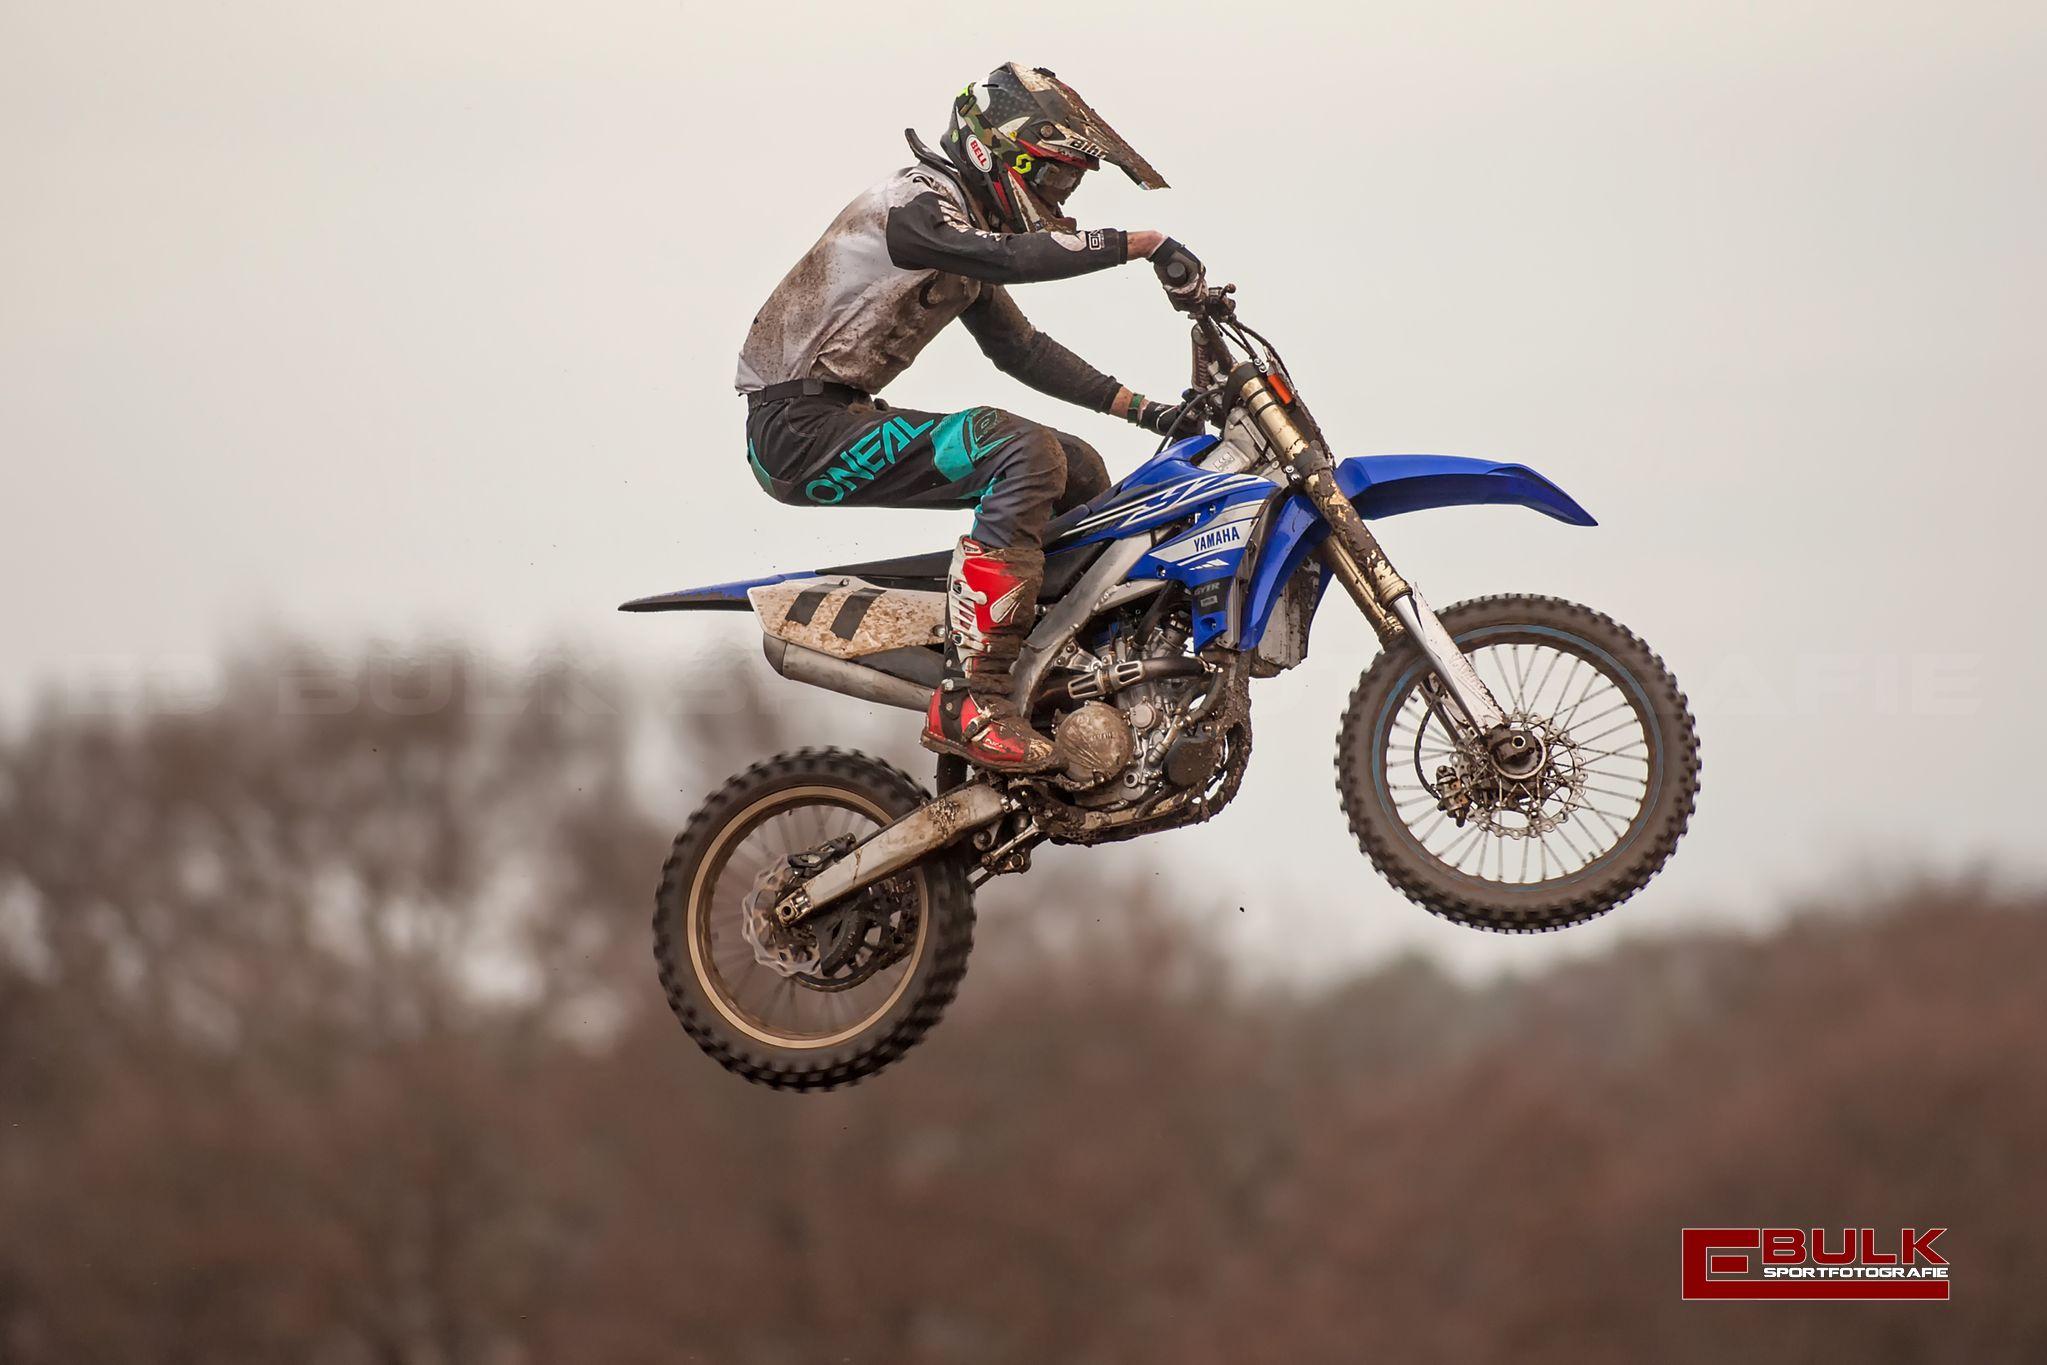 ebs_0694-ed_bulk_sportfotografie